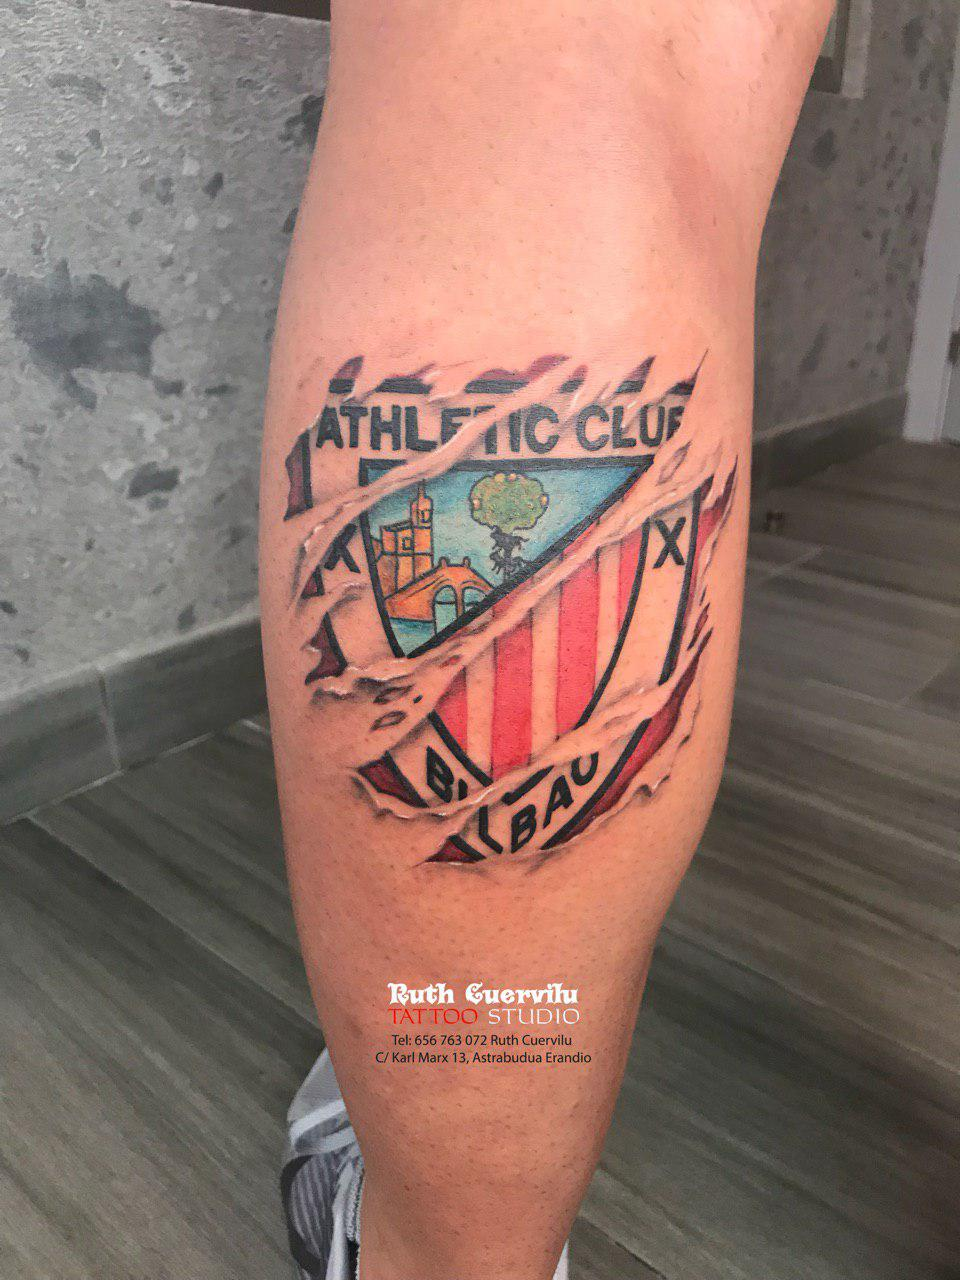 Tatuaje Athletic Club Bilbao - ruth cuervilu tattoo - km13 studio - estudio de tatuajes en Astrabudua Erandio